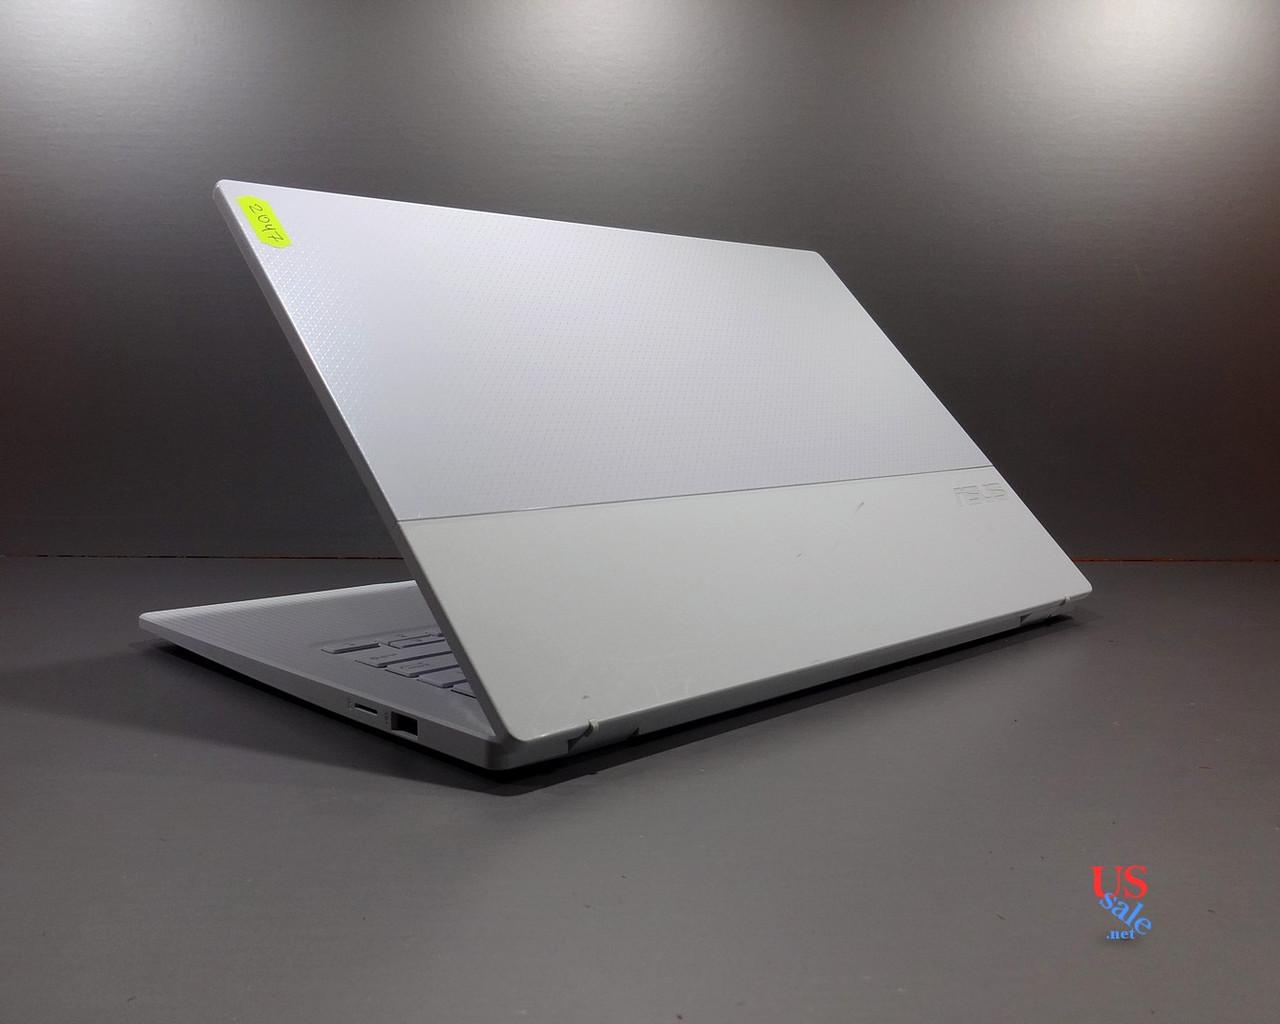 "Ноутбук Asus ImagineBook MJ401T 14"", Intel Core m3-8100Y 1.1 Ghz, 4Gb DDR3, 256Gb SSD. Гарантія!"